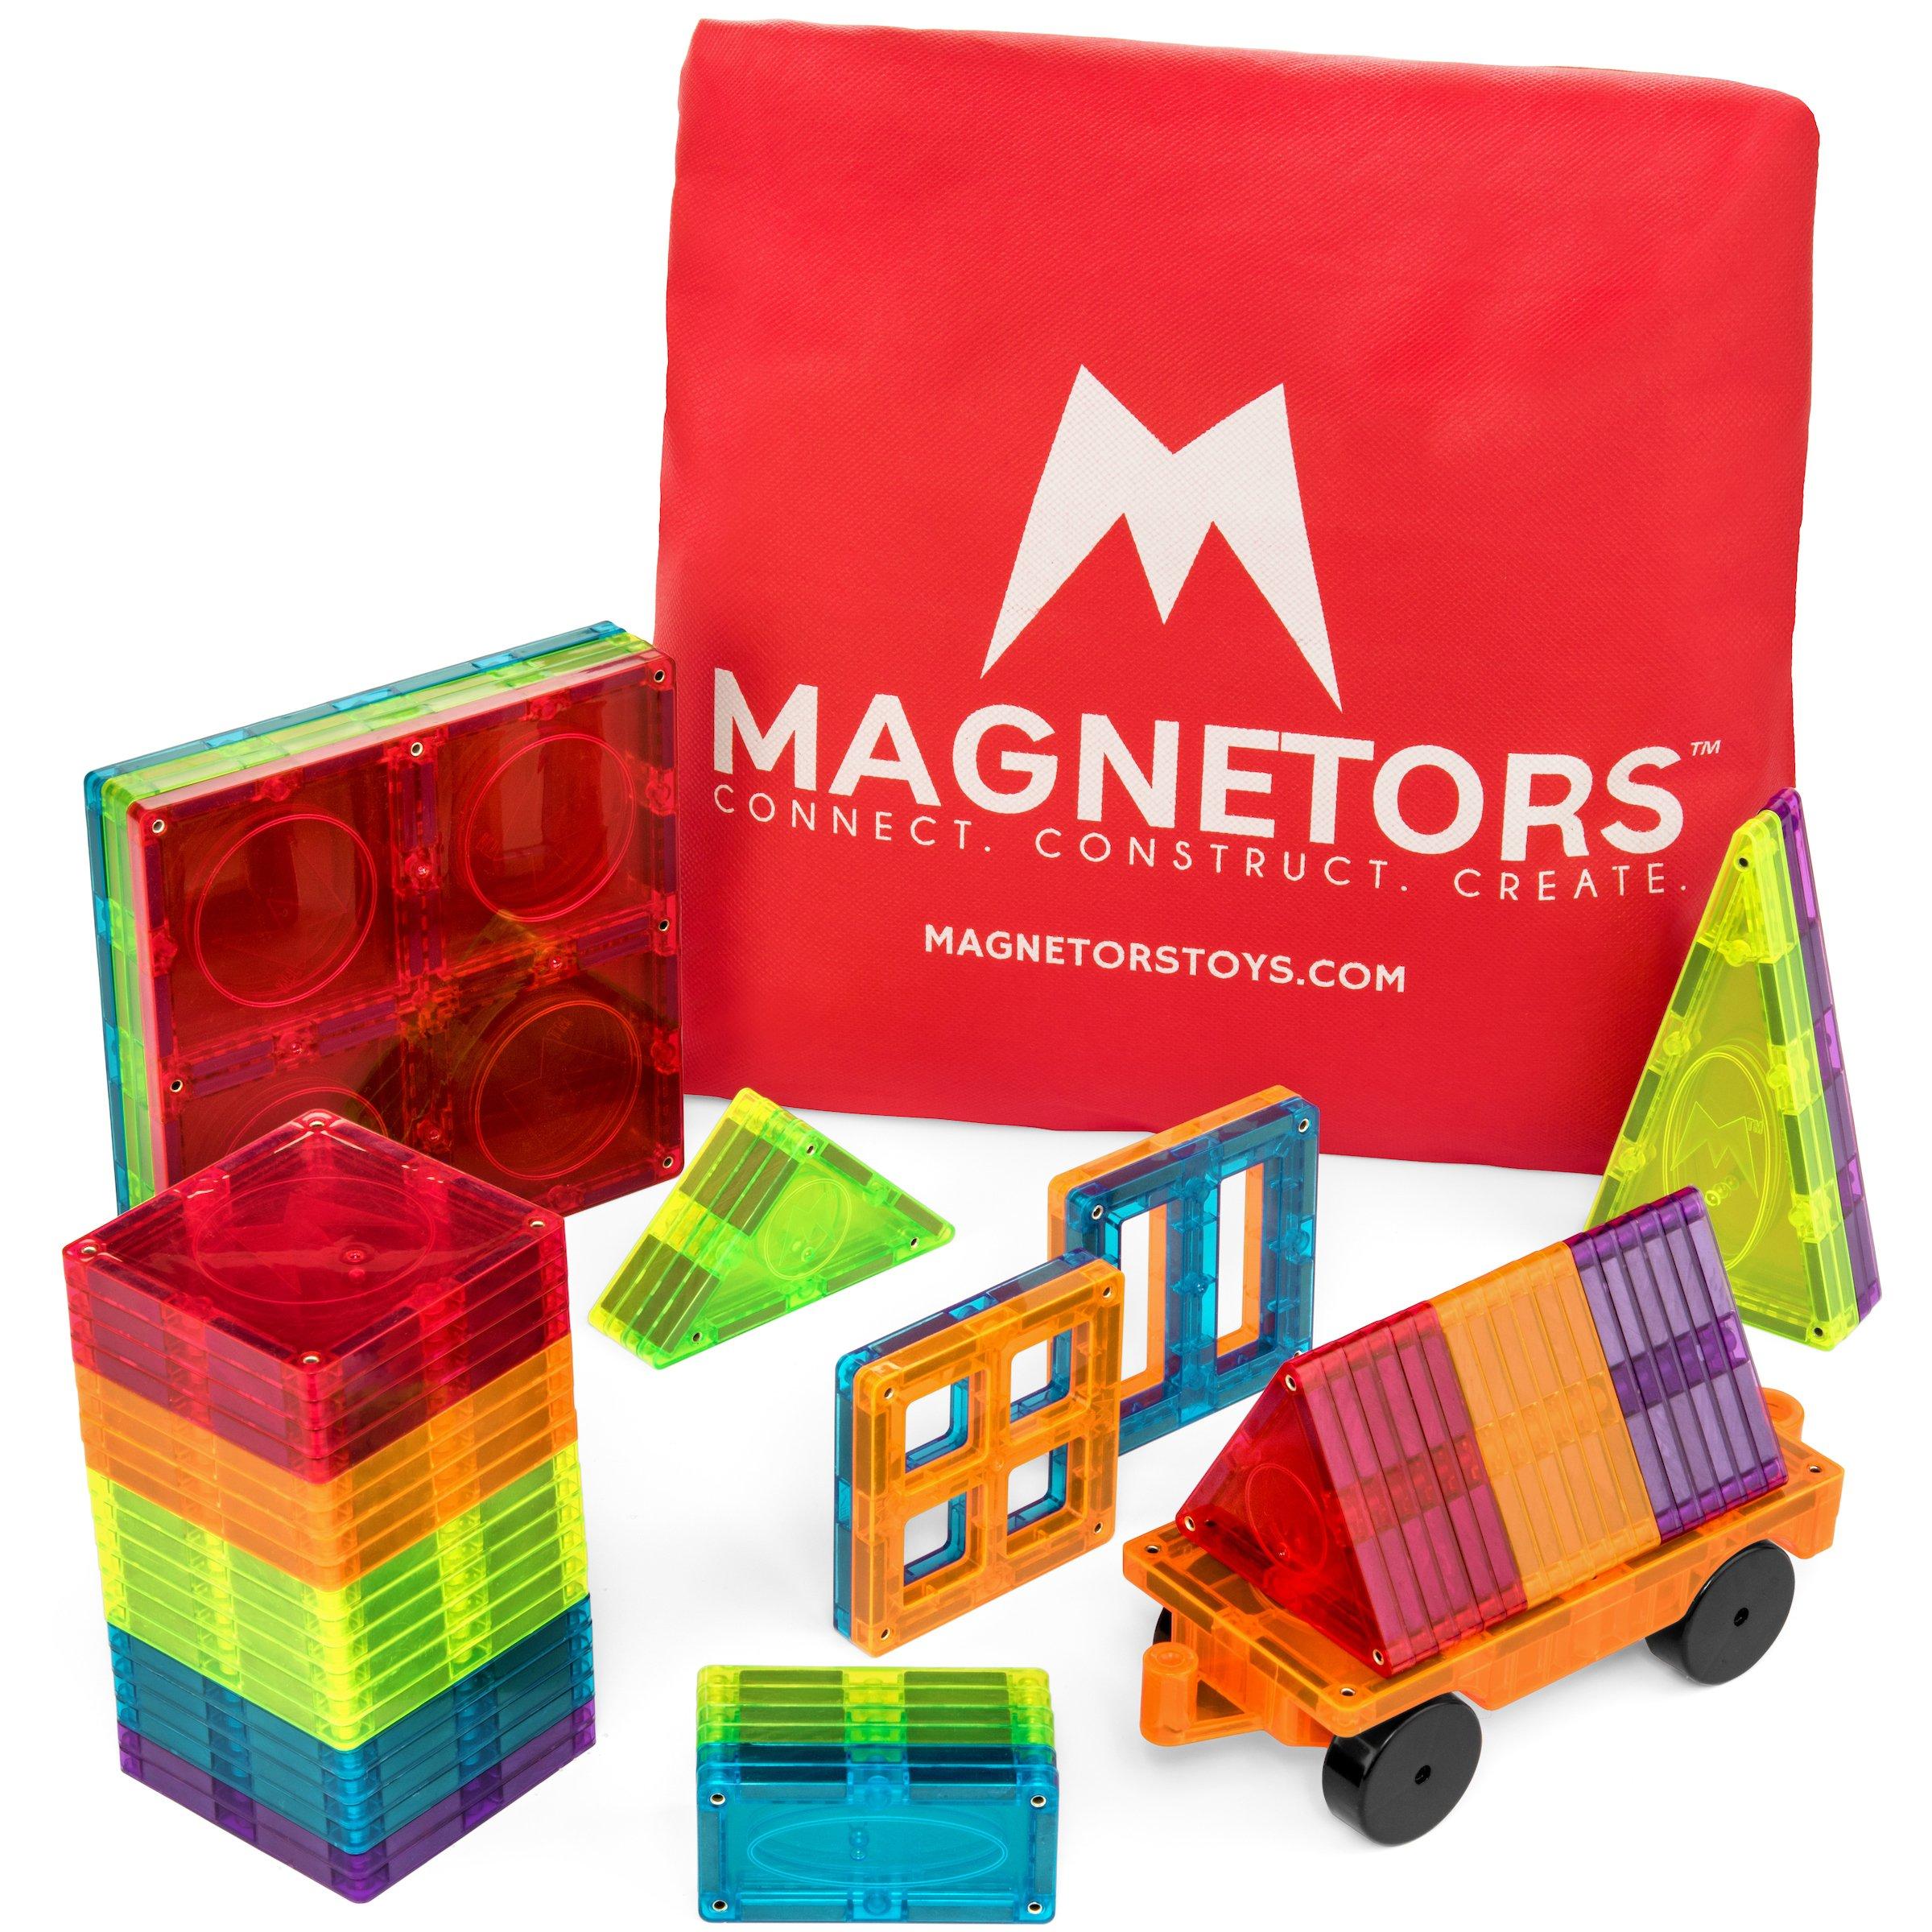 Magnetors Magnetic Building Blocks Tiles - 3D STEM Construction Toys for Kids, Educational Montessori Boys & Girls Toy, Large & Small Shapes & Sizes, 60 Piece Set + Car + Bonus Travel Bag